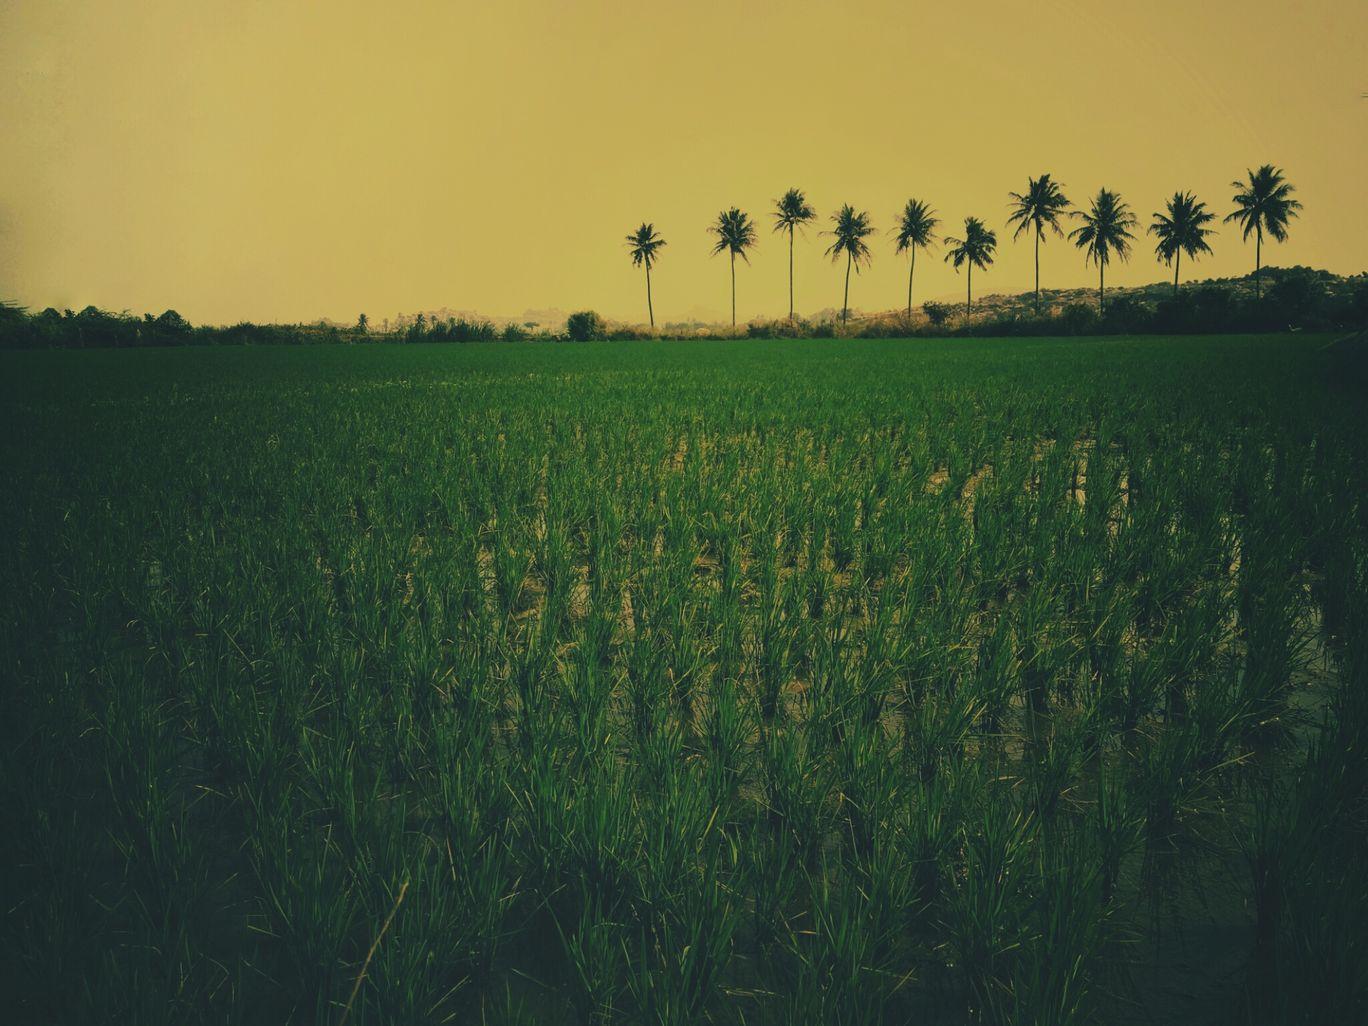 Photo of Anegundi By Abhishek.Banakar